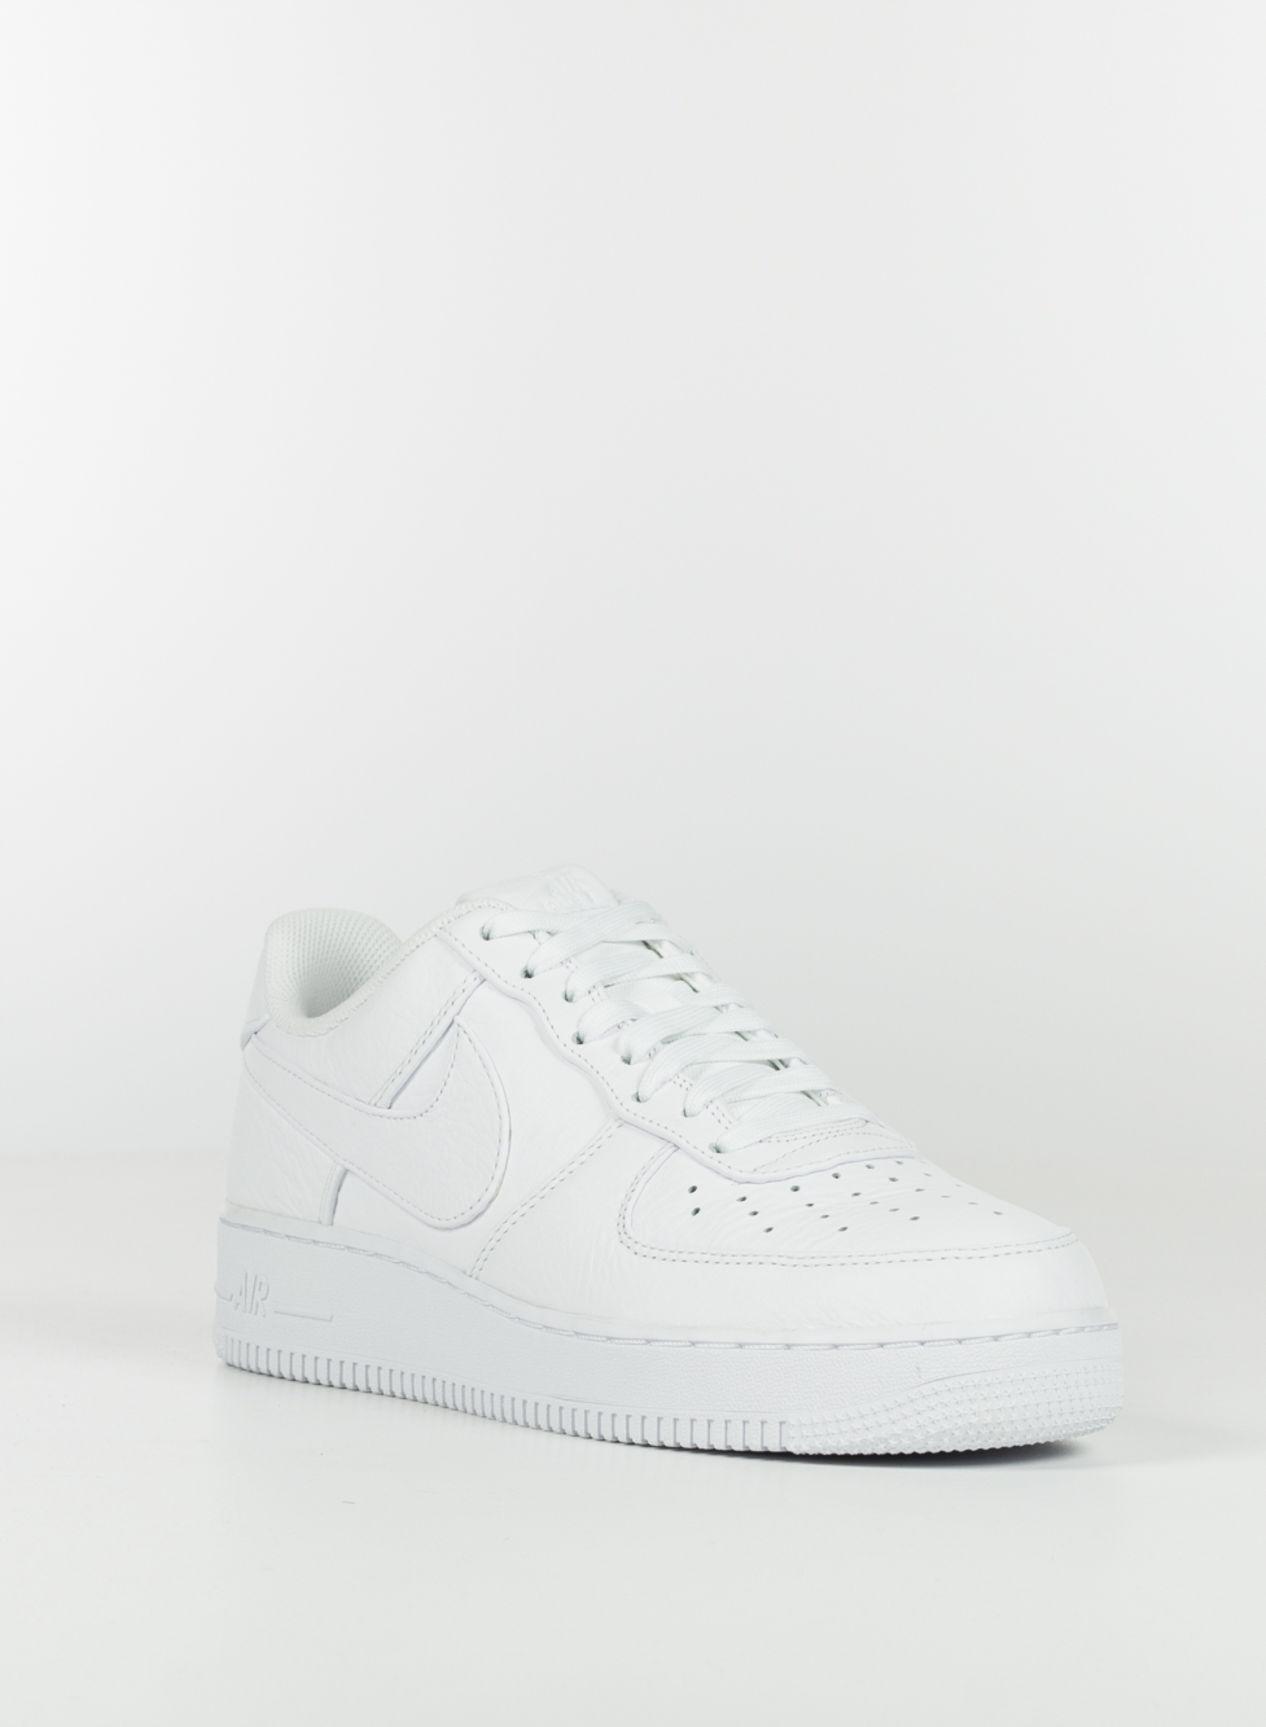 Nike Air Force 1 '07 Premium 2 White AT4143 103